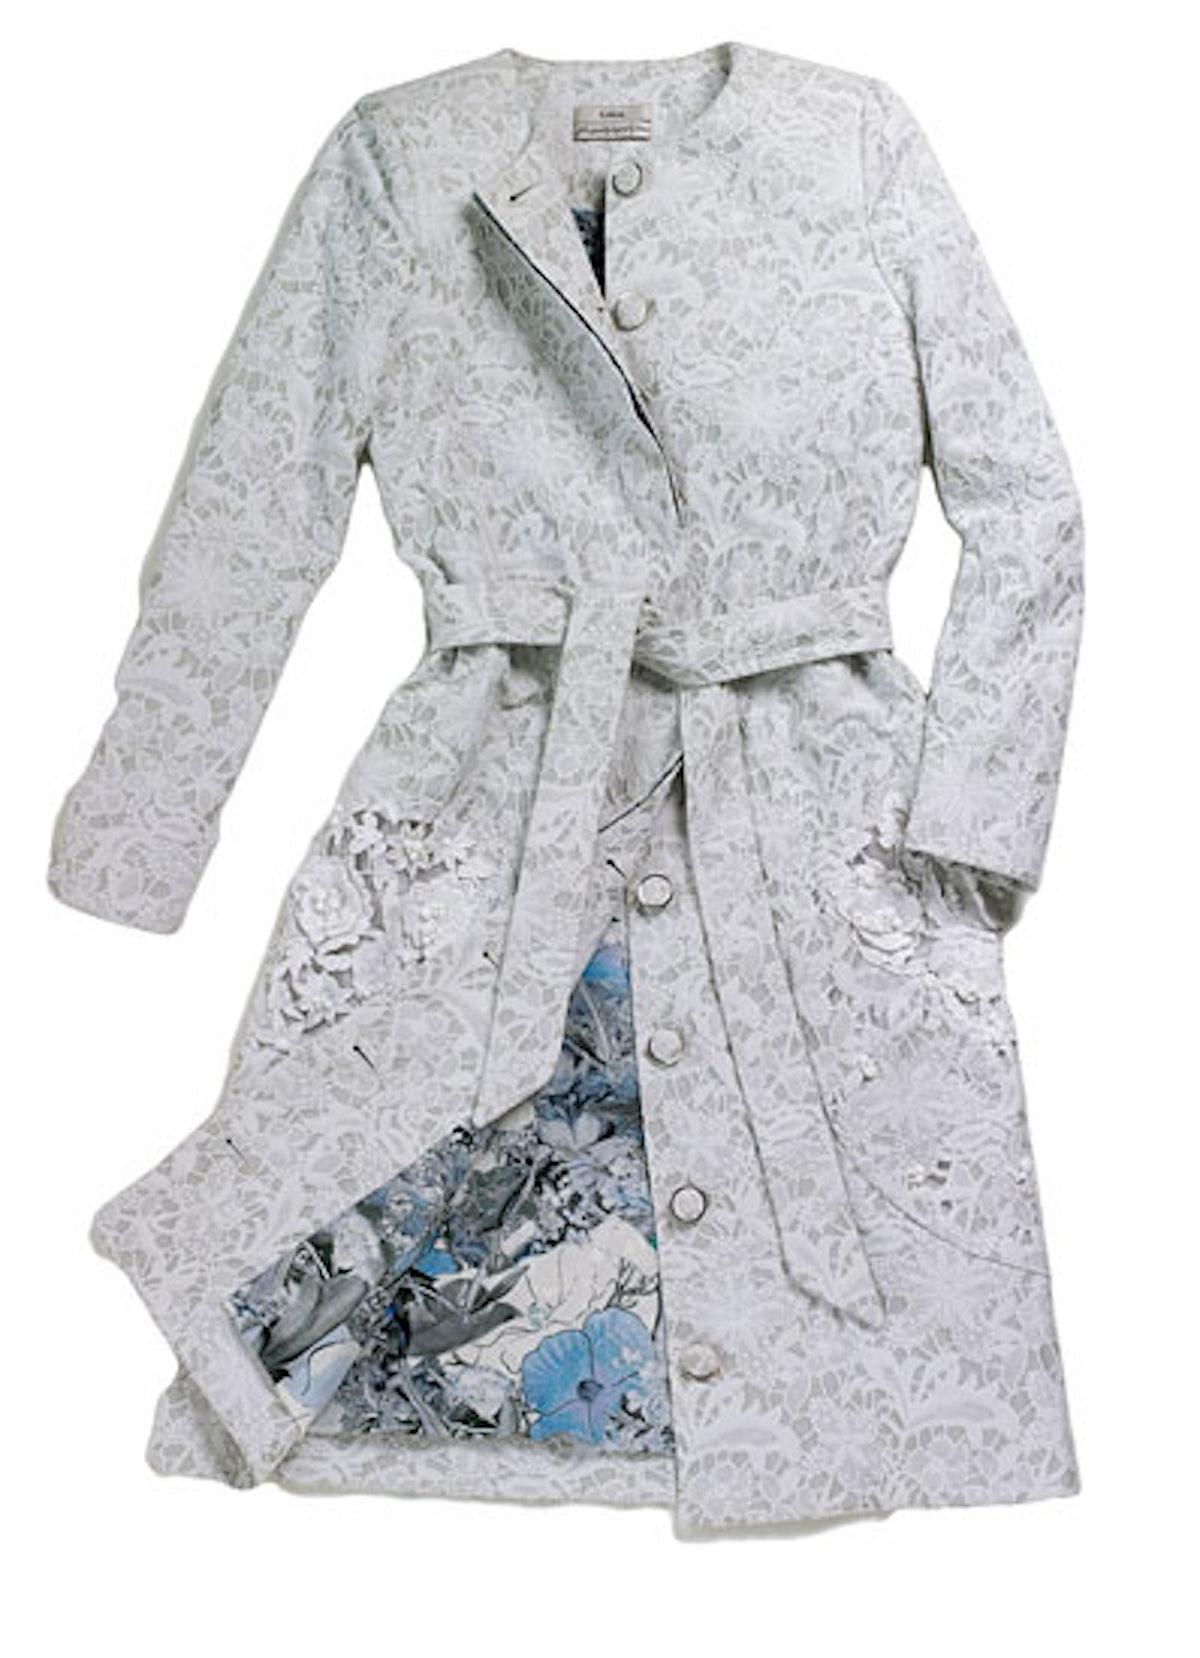 cess-carey-mulligan-cover-fashion-04-v.jpg